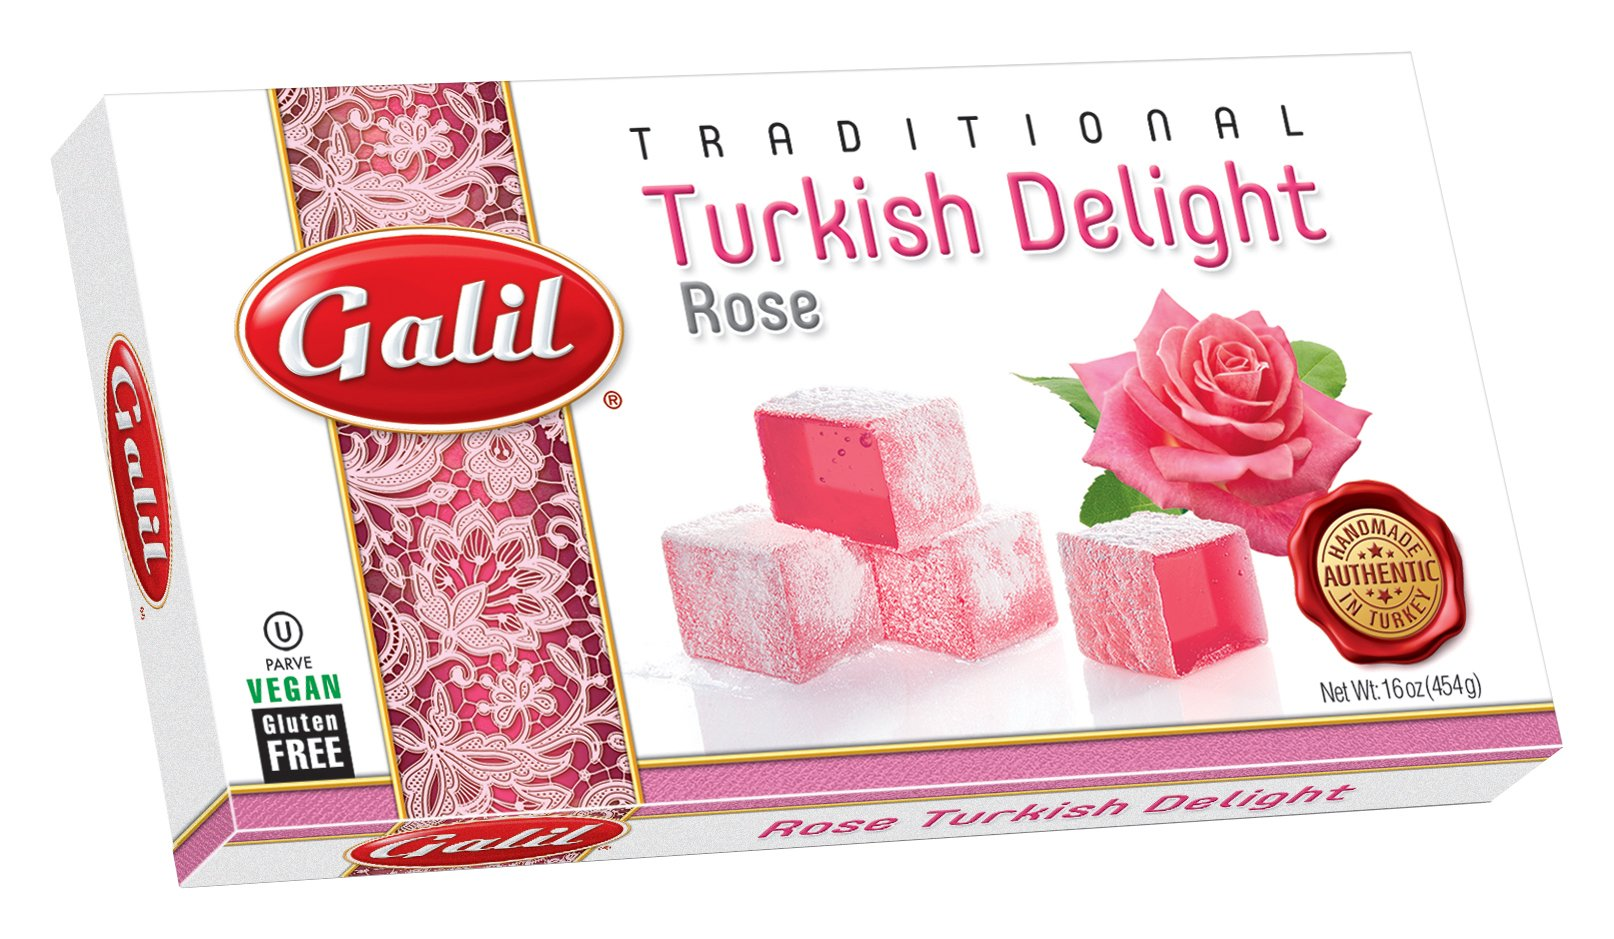 Shams turkish delight rose pistachio cardamom for Divan rose turkish delight